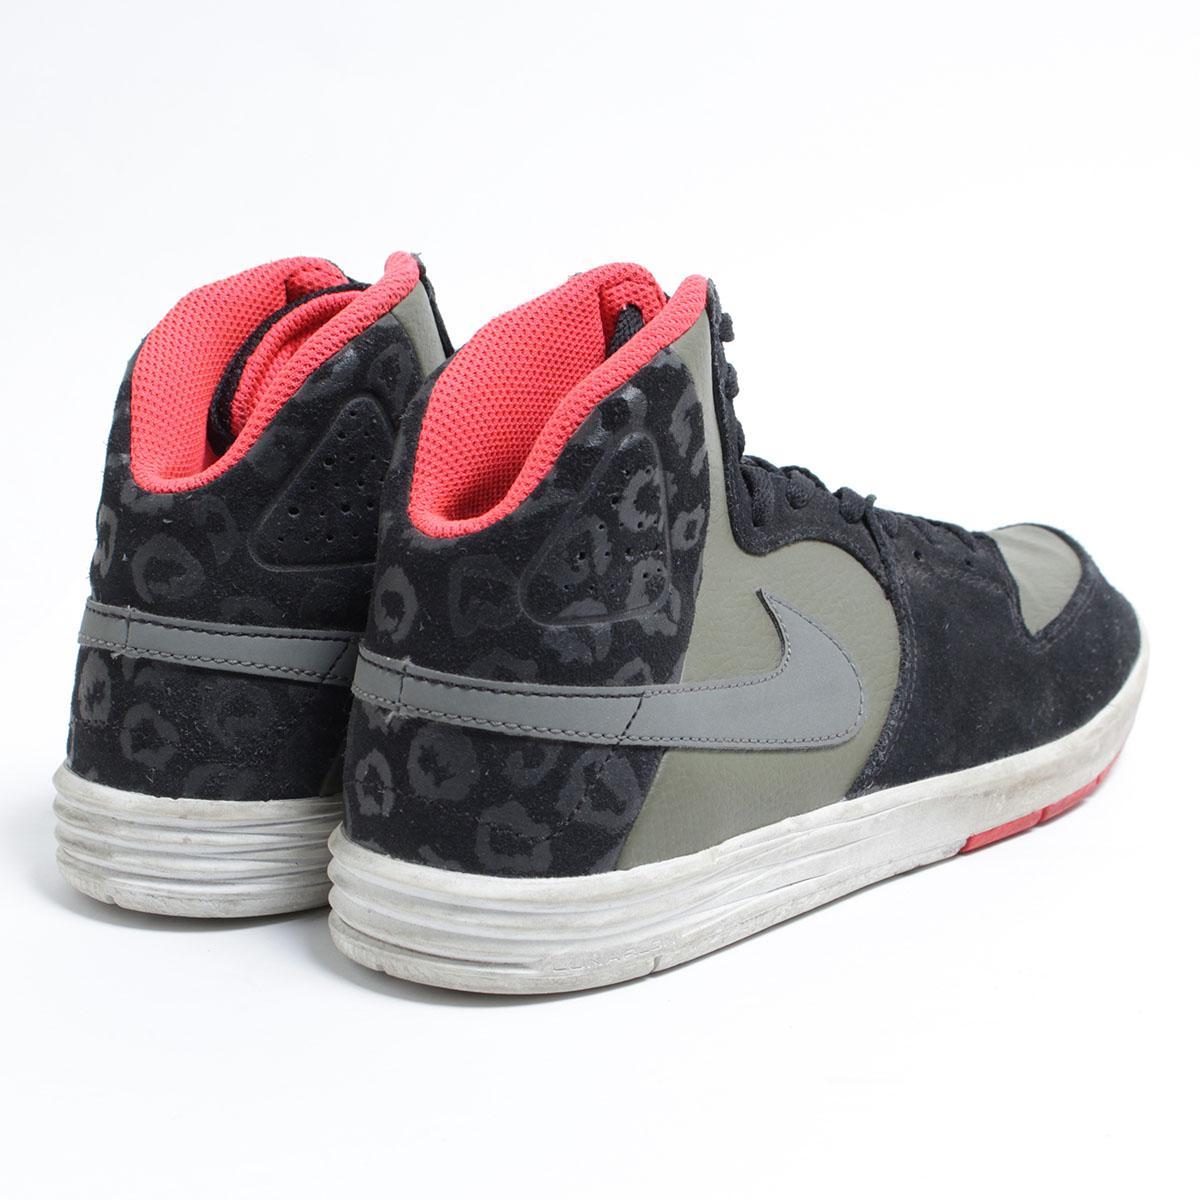 b873097a03b Nike NIKE SB PAUL RODRIGUEZ 7 HIGH sneakers US7Y Lady s 25.0cm  bol7384